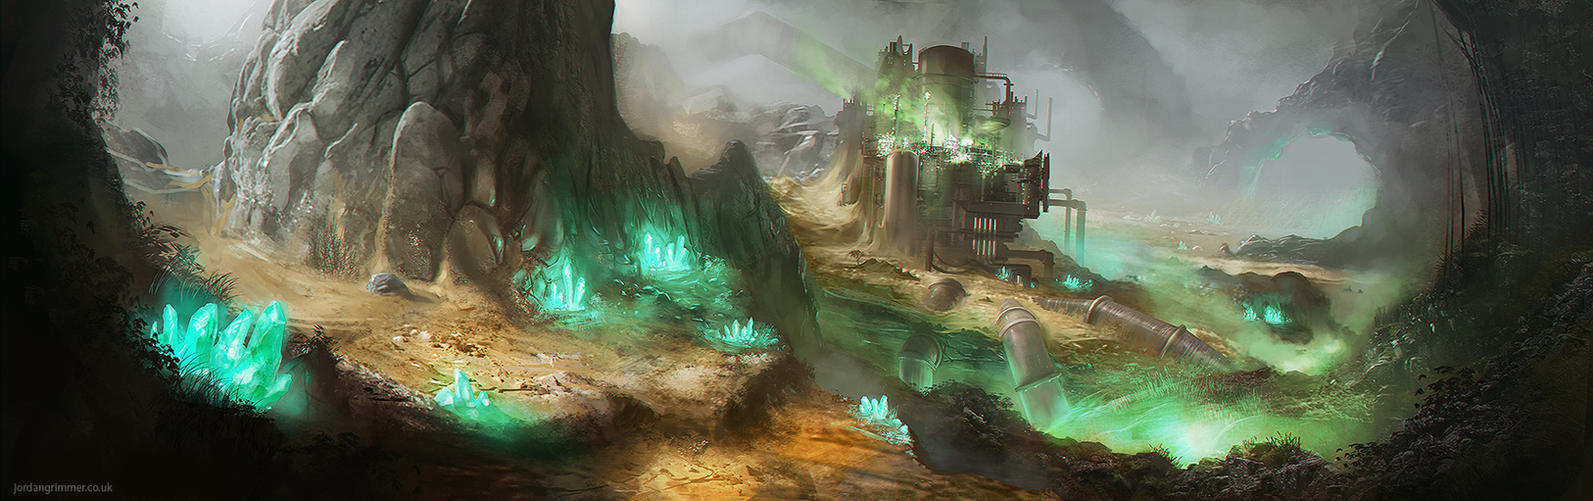 Nibelheim Reactor by jordangrimmer